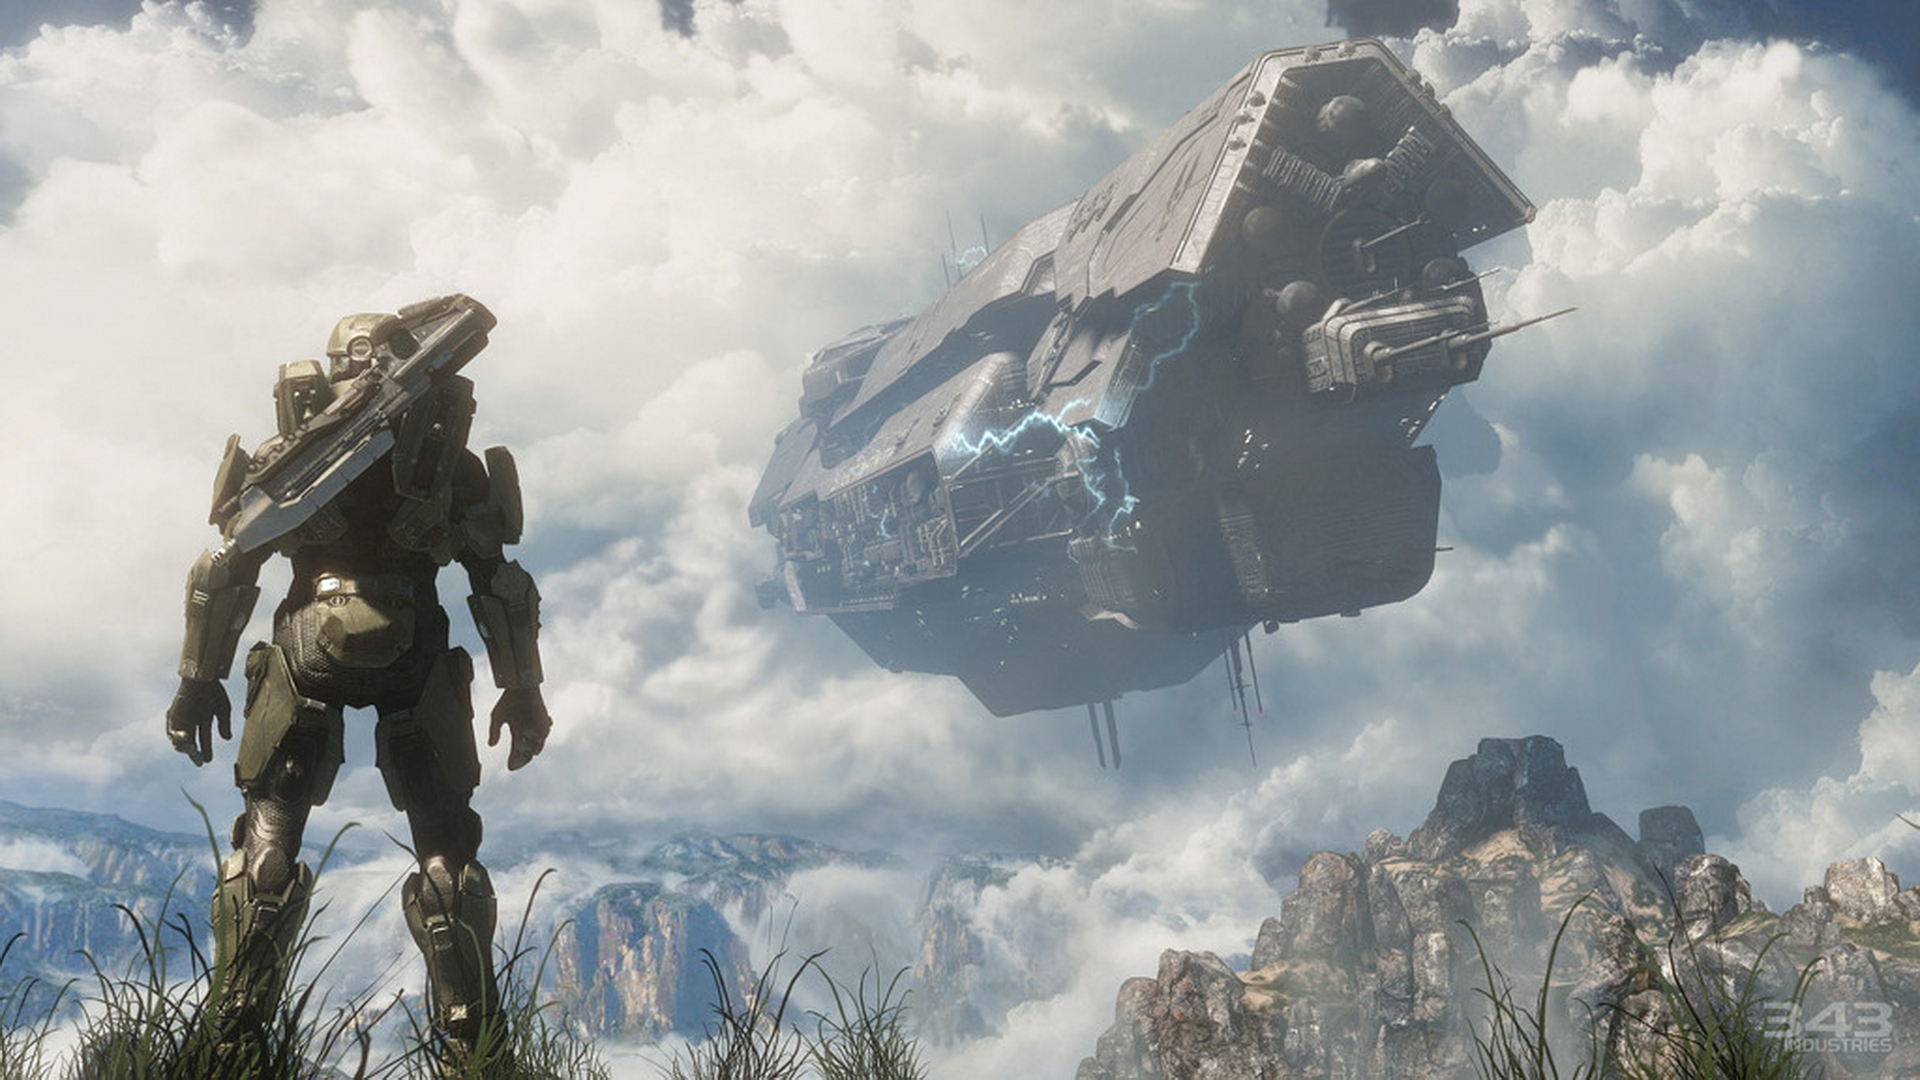 Halo 4   Master Chief Spartan   UNSC ship crashing 1920x1080